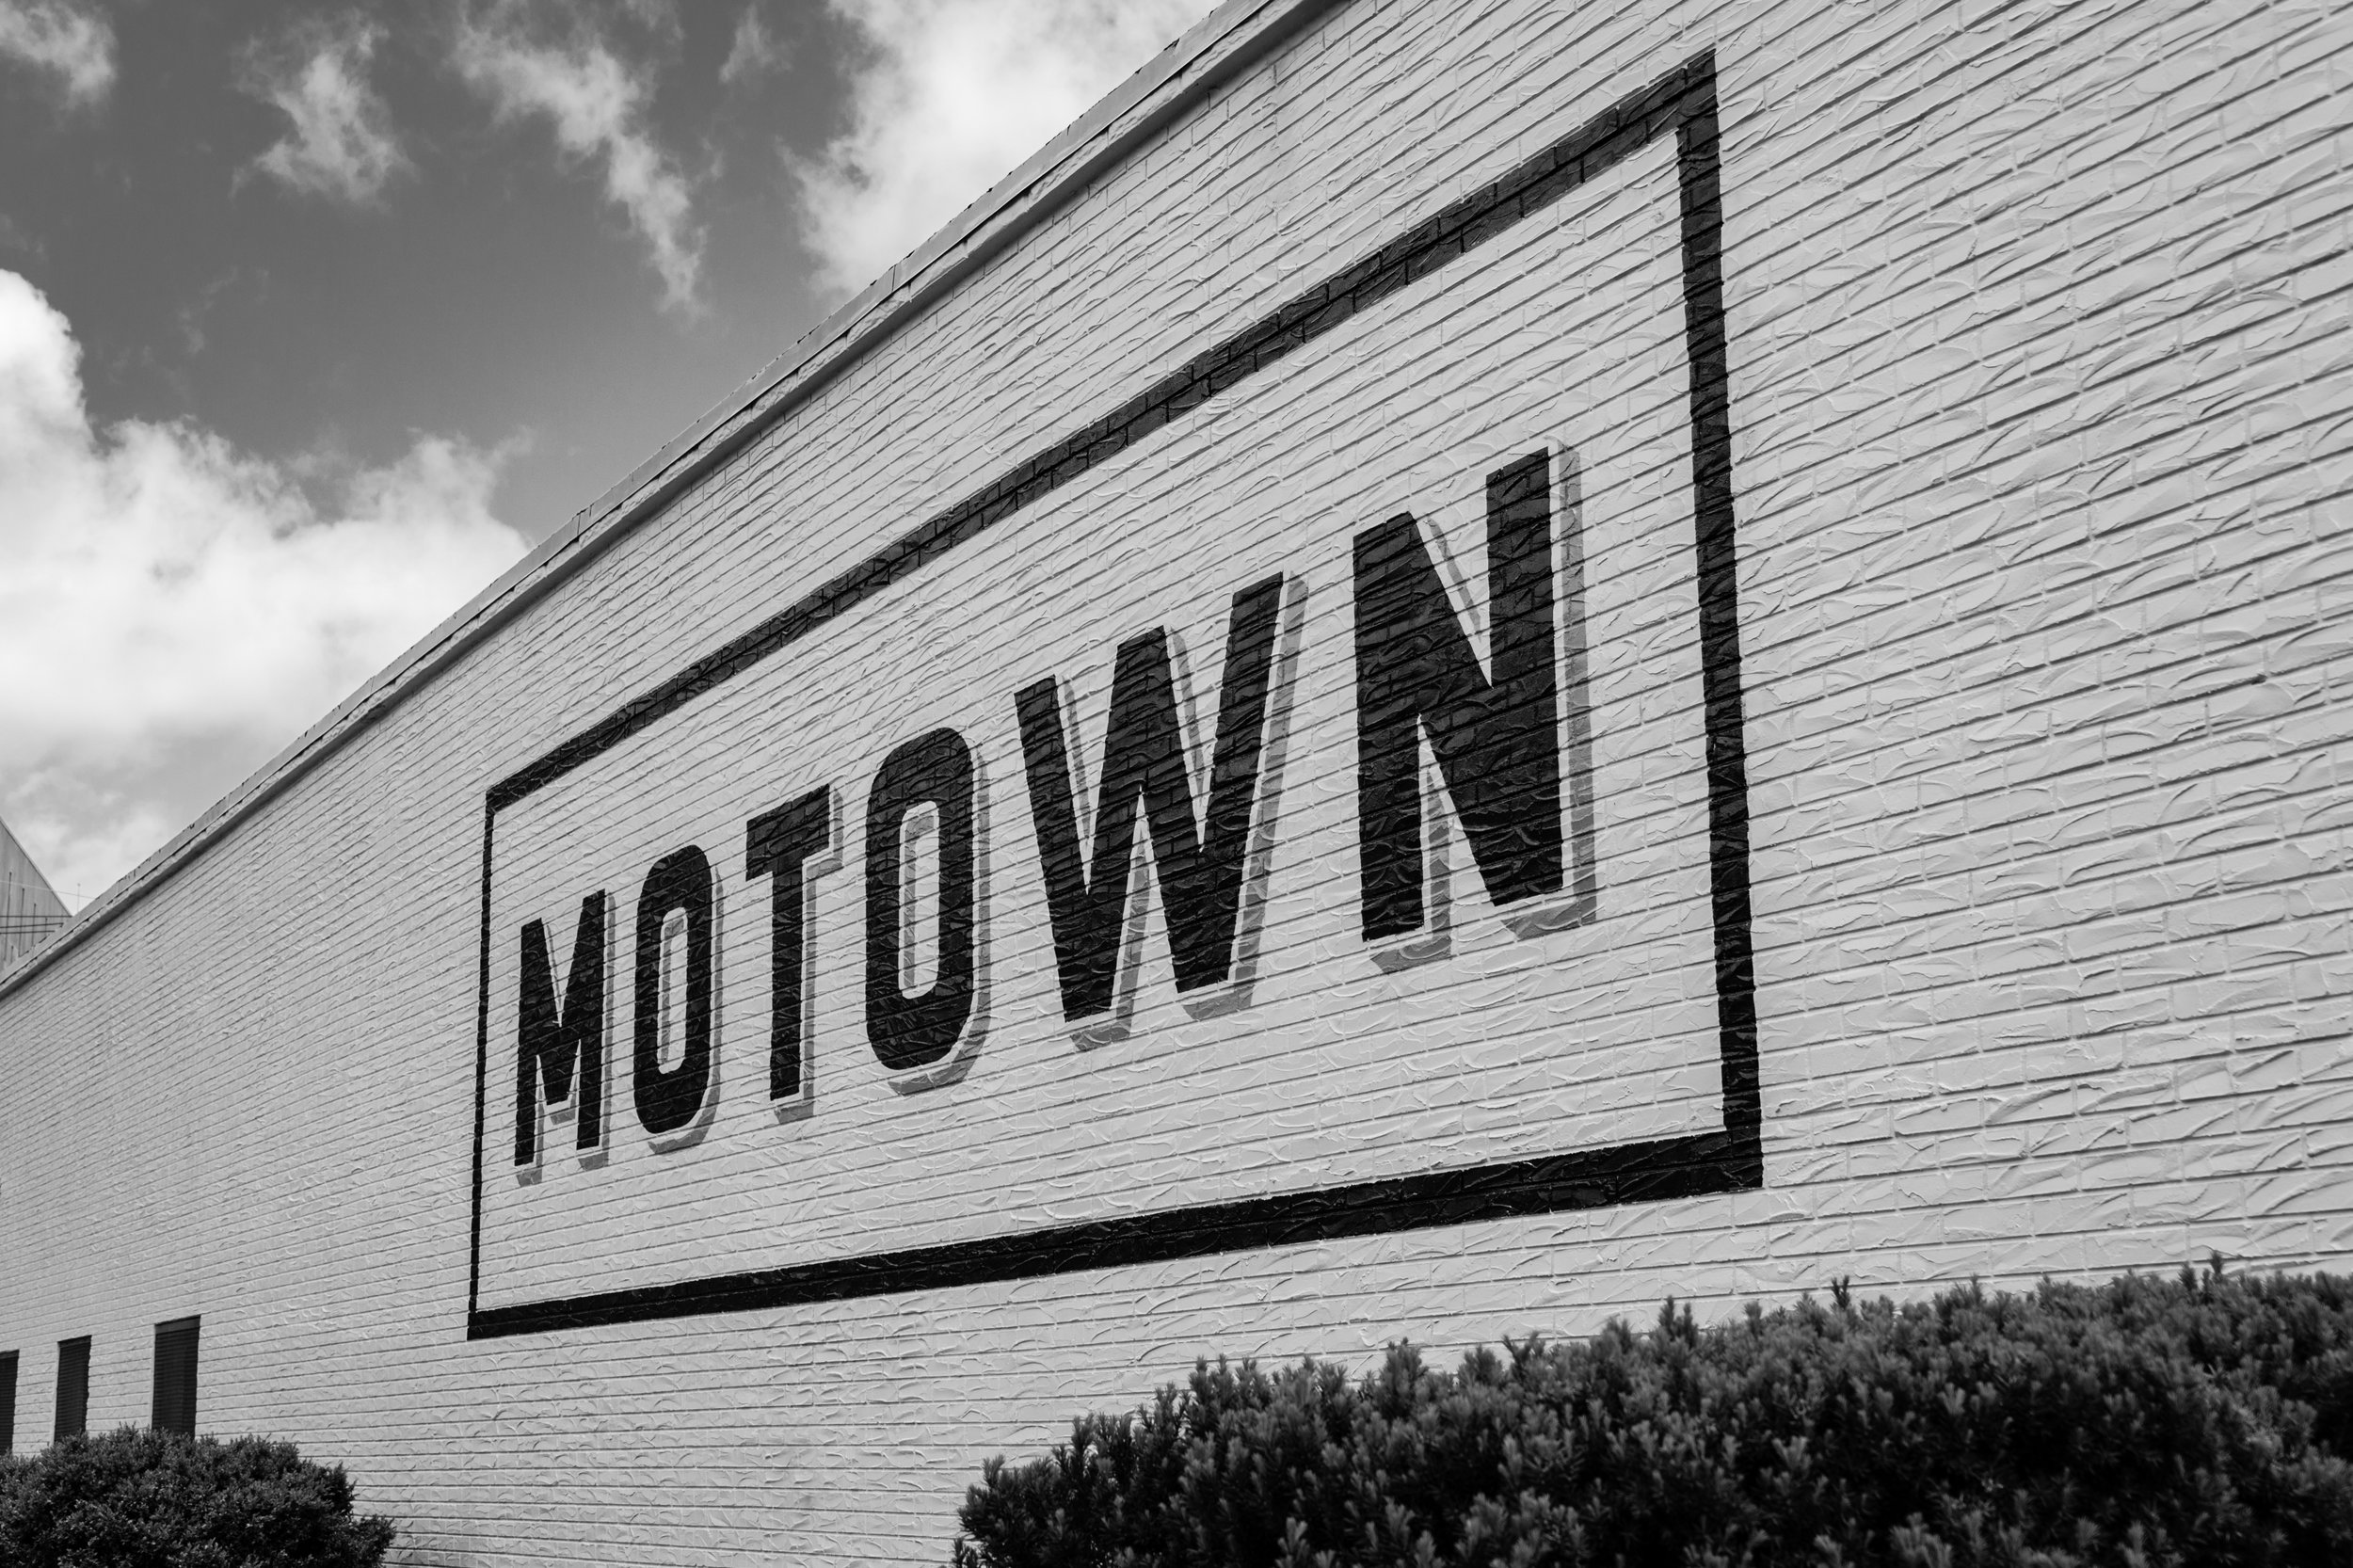 Morristown -